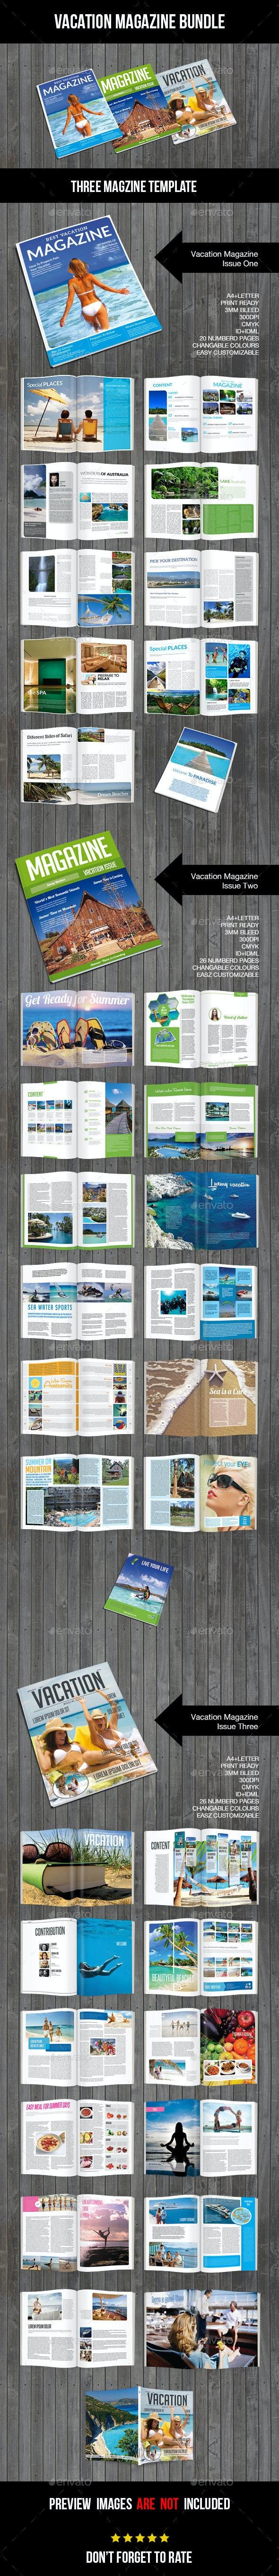 Bundle Set Vacation Magazine  - Magazines Print Templates